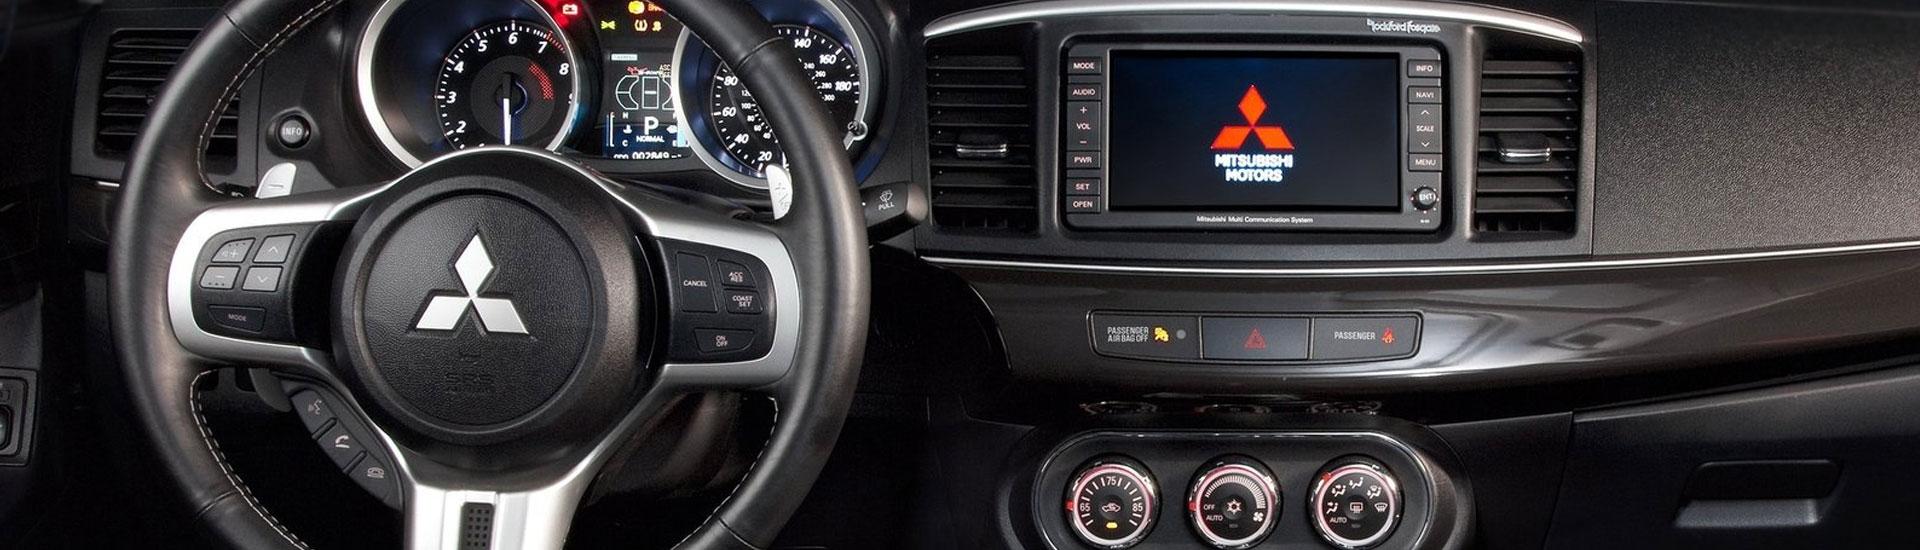 mitsubishi lancer custom dash kits - Mitsubishi Lancer Custom